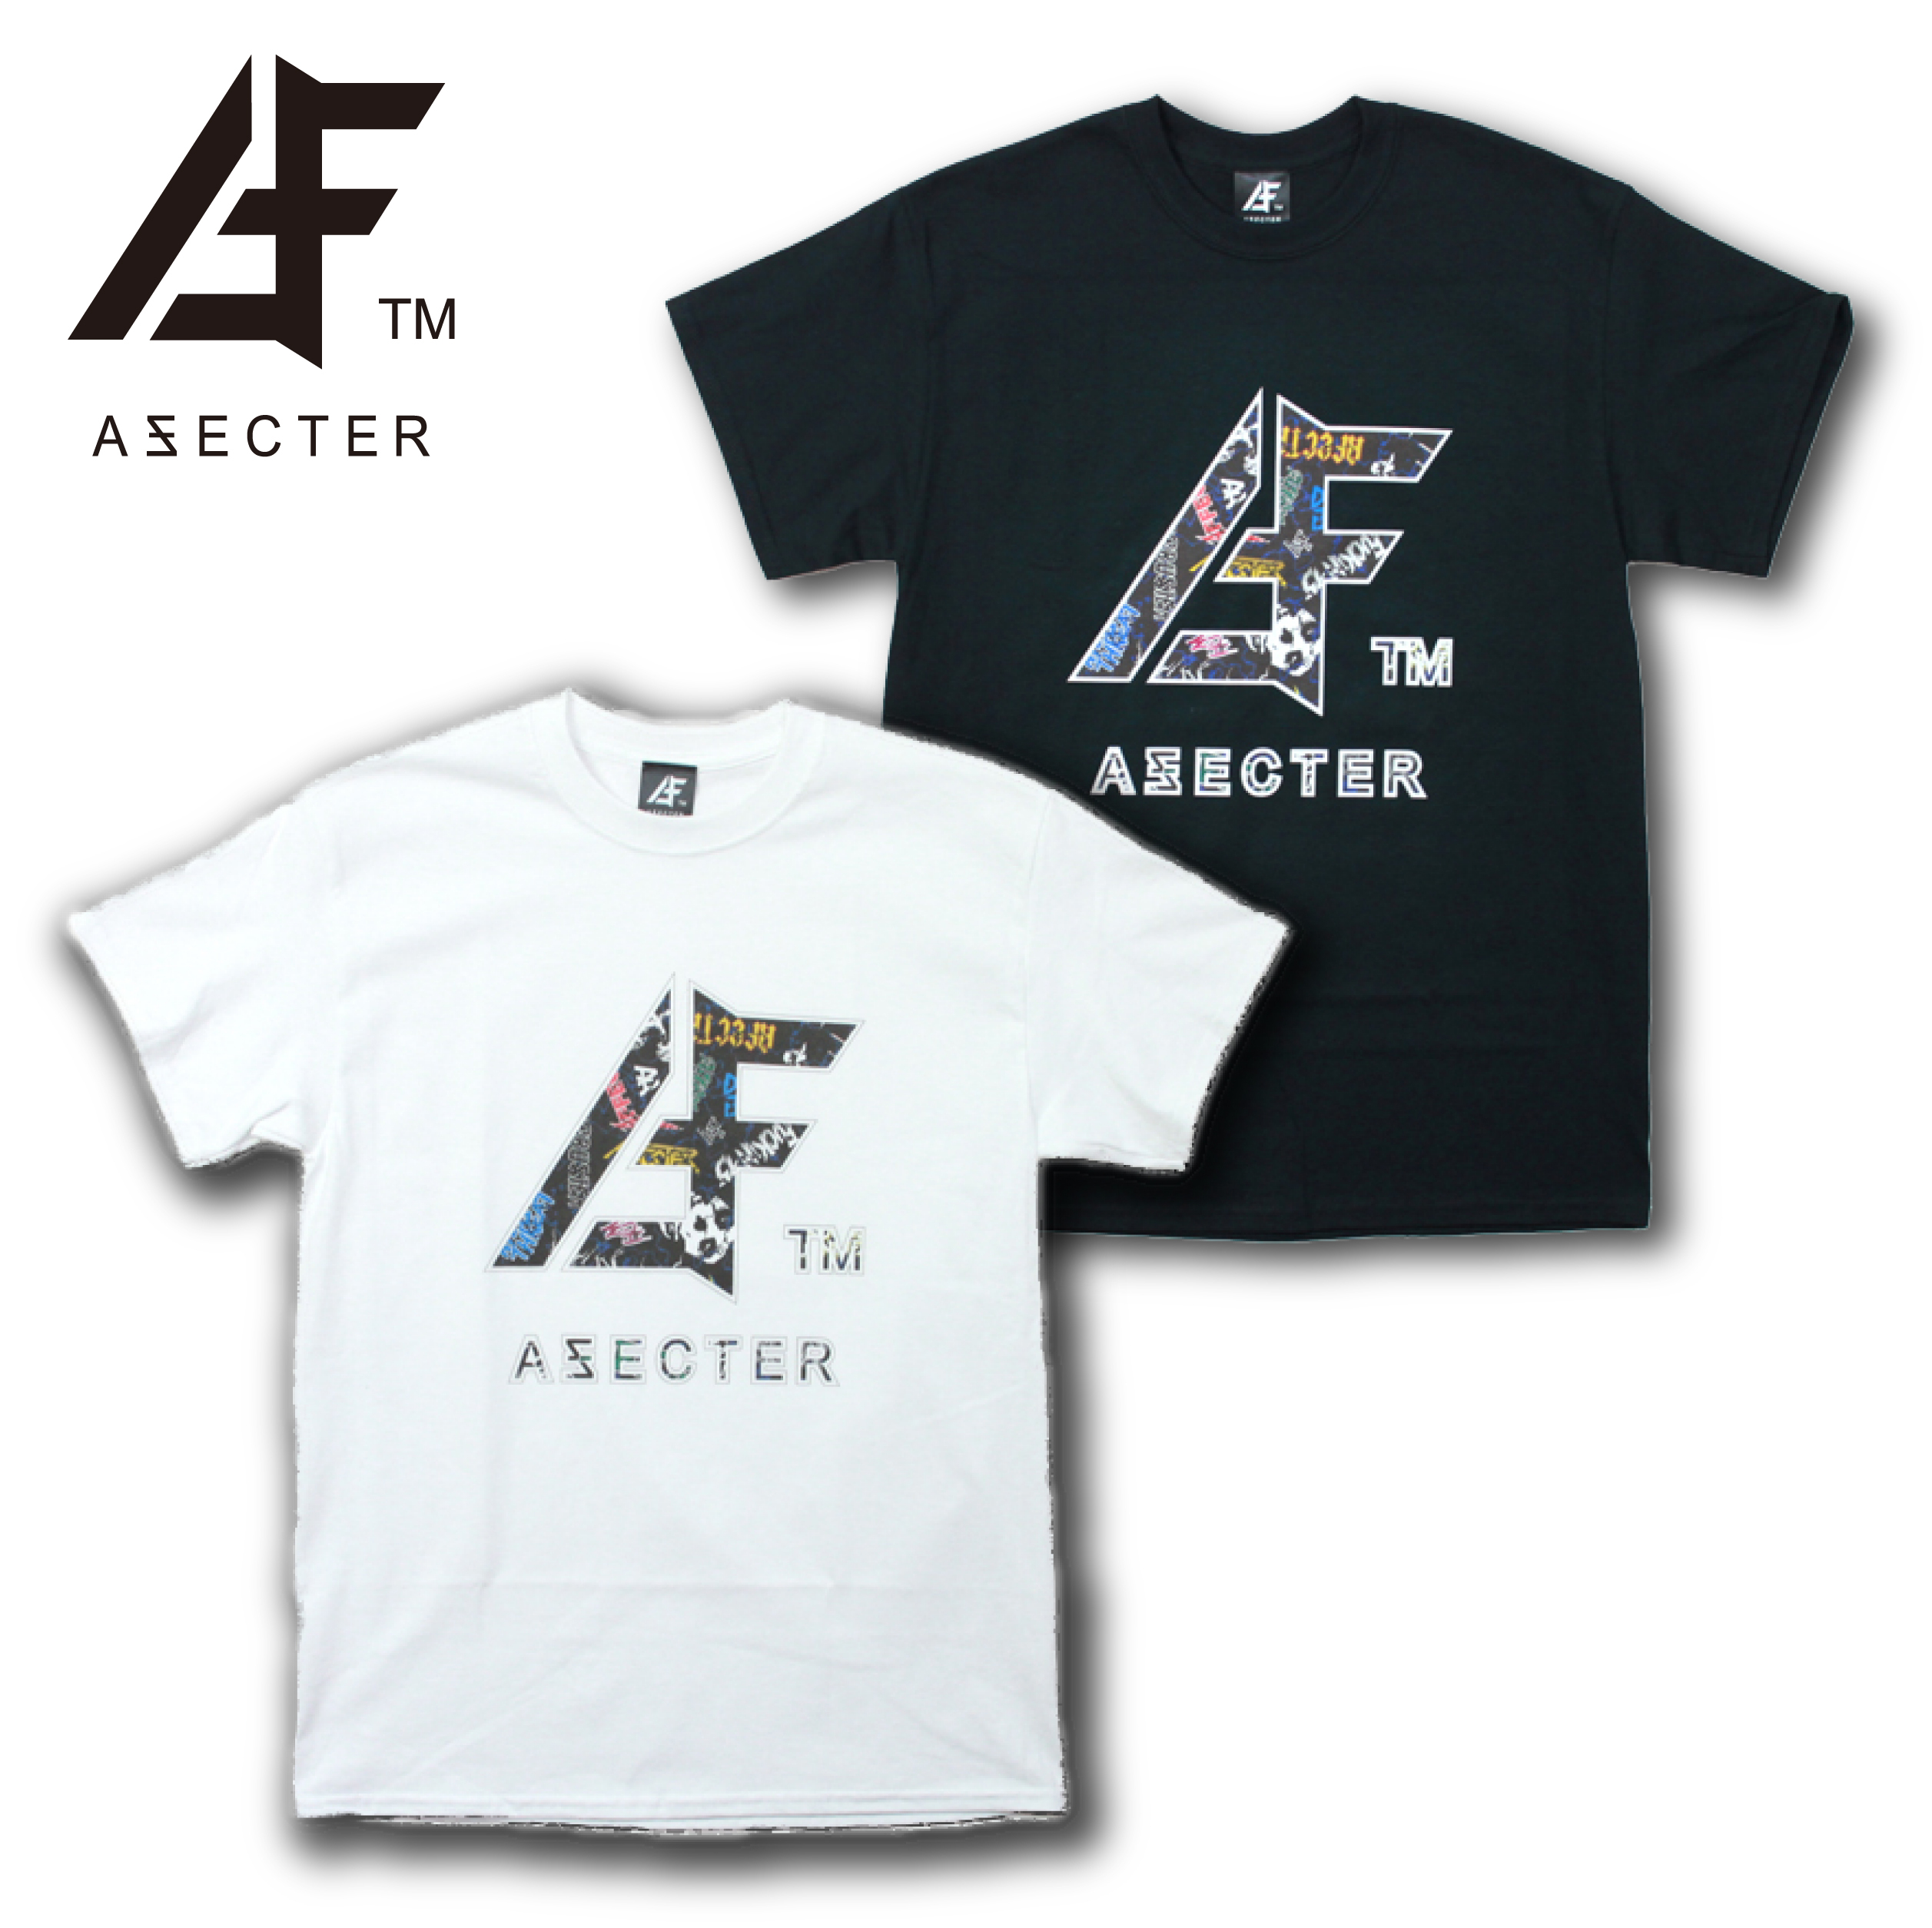 AFFECTER (アフェクター) | BANDDIXXX TM S/S Tee